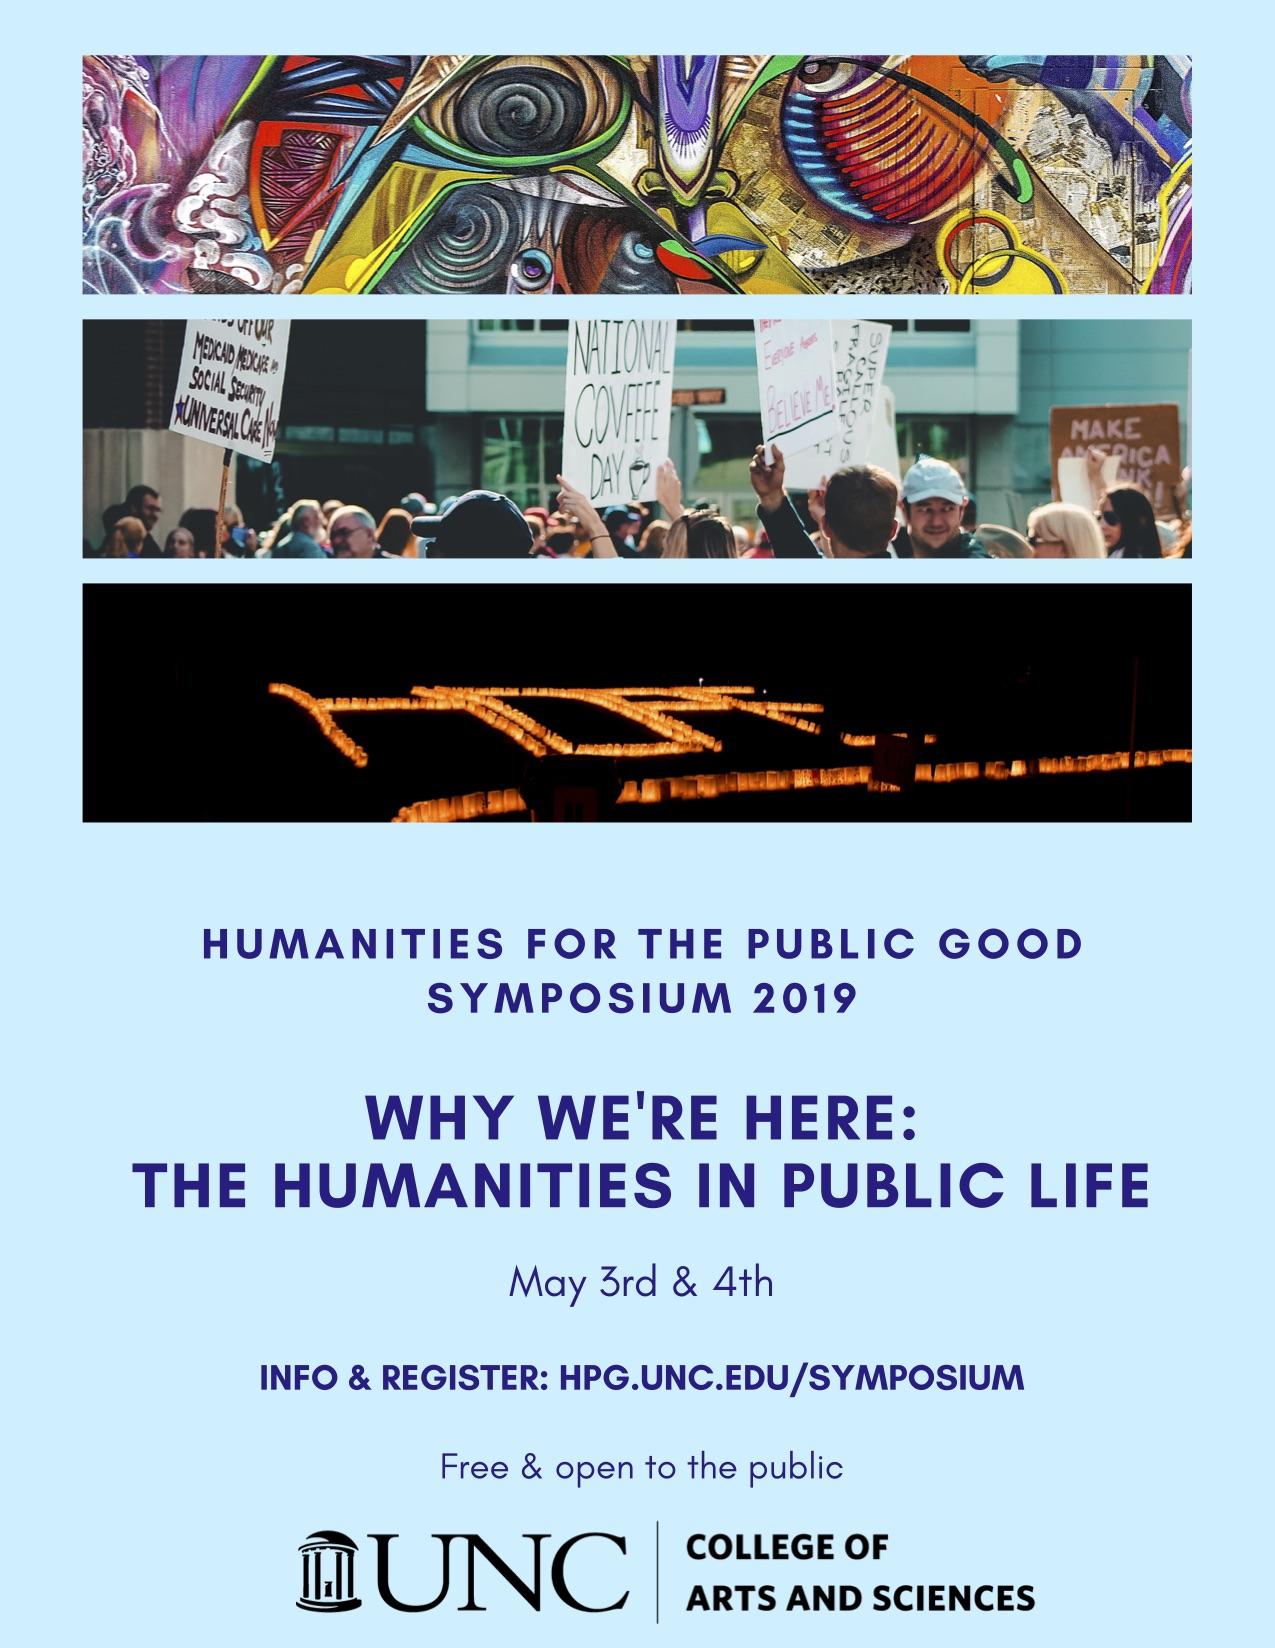 Flyer for HPG Symposium 2019